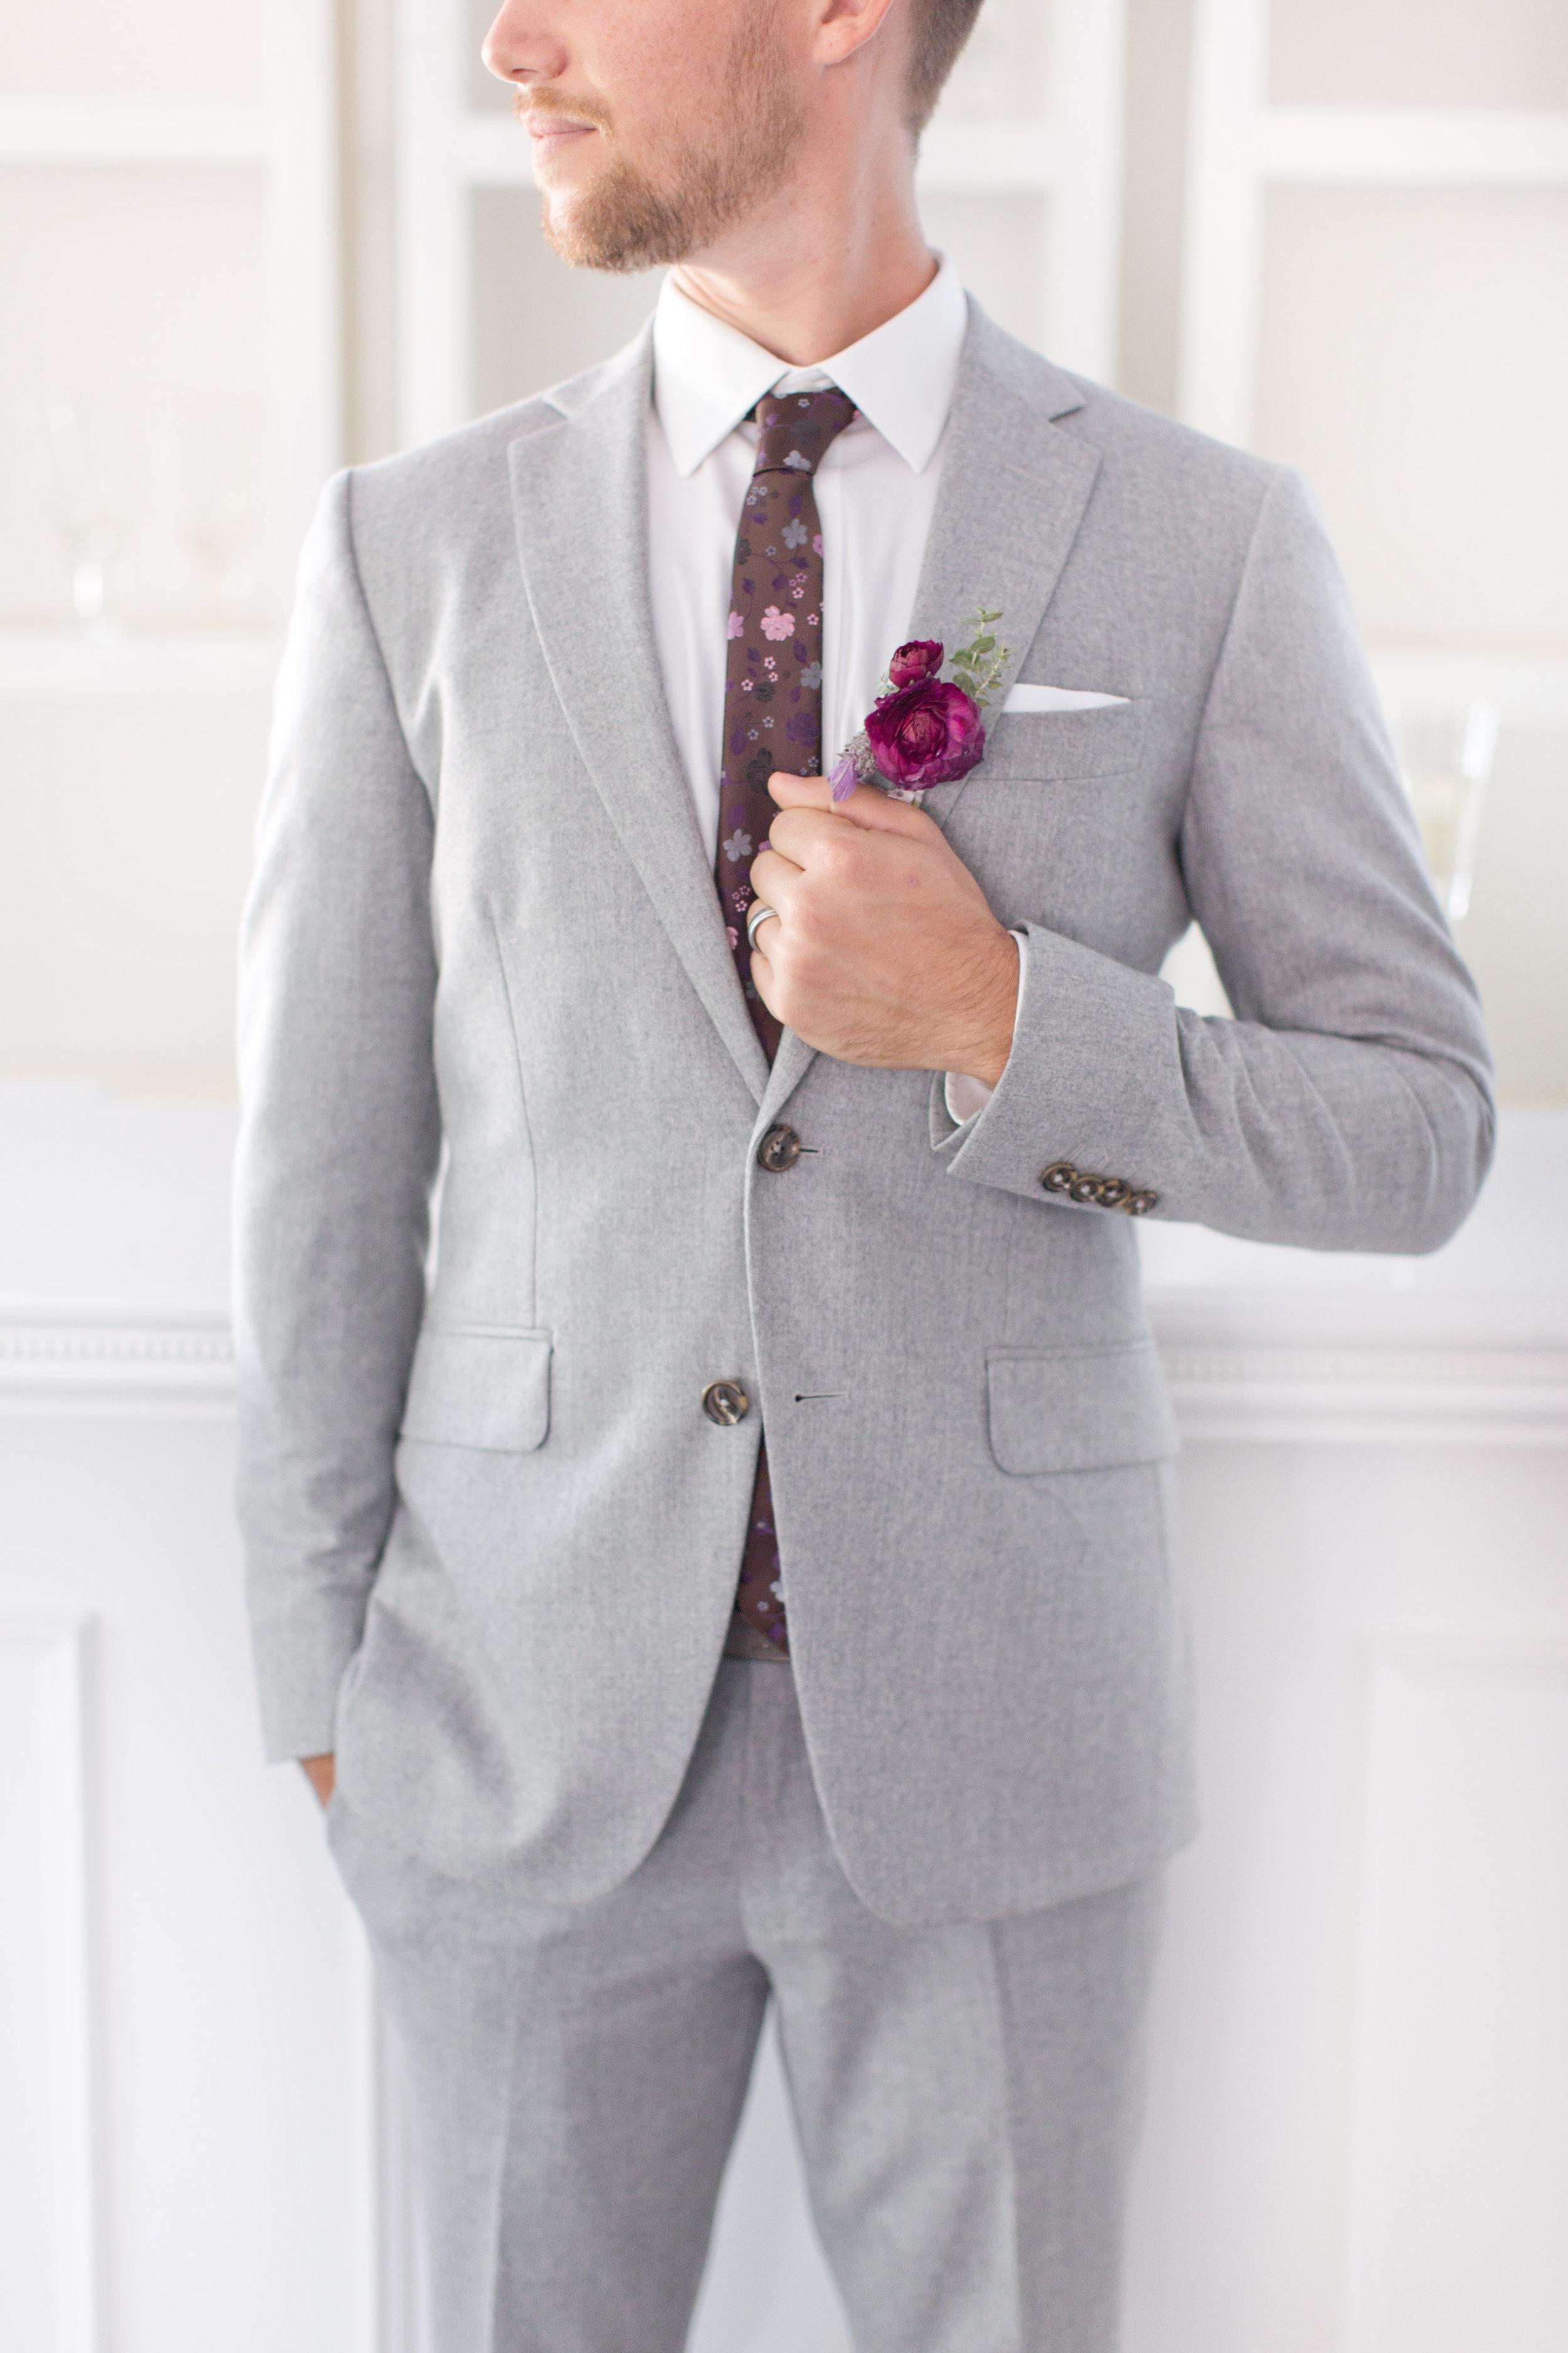 Amy & Jordan Workshop - Groom in light grey custom suit with purple boutonniere